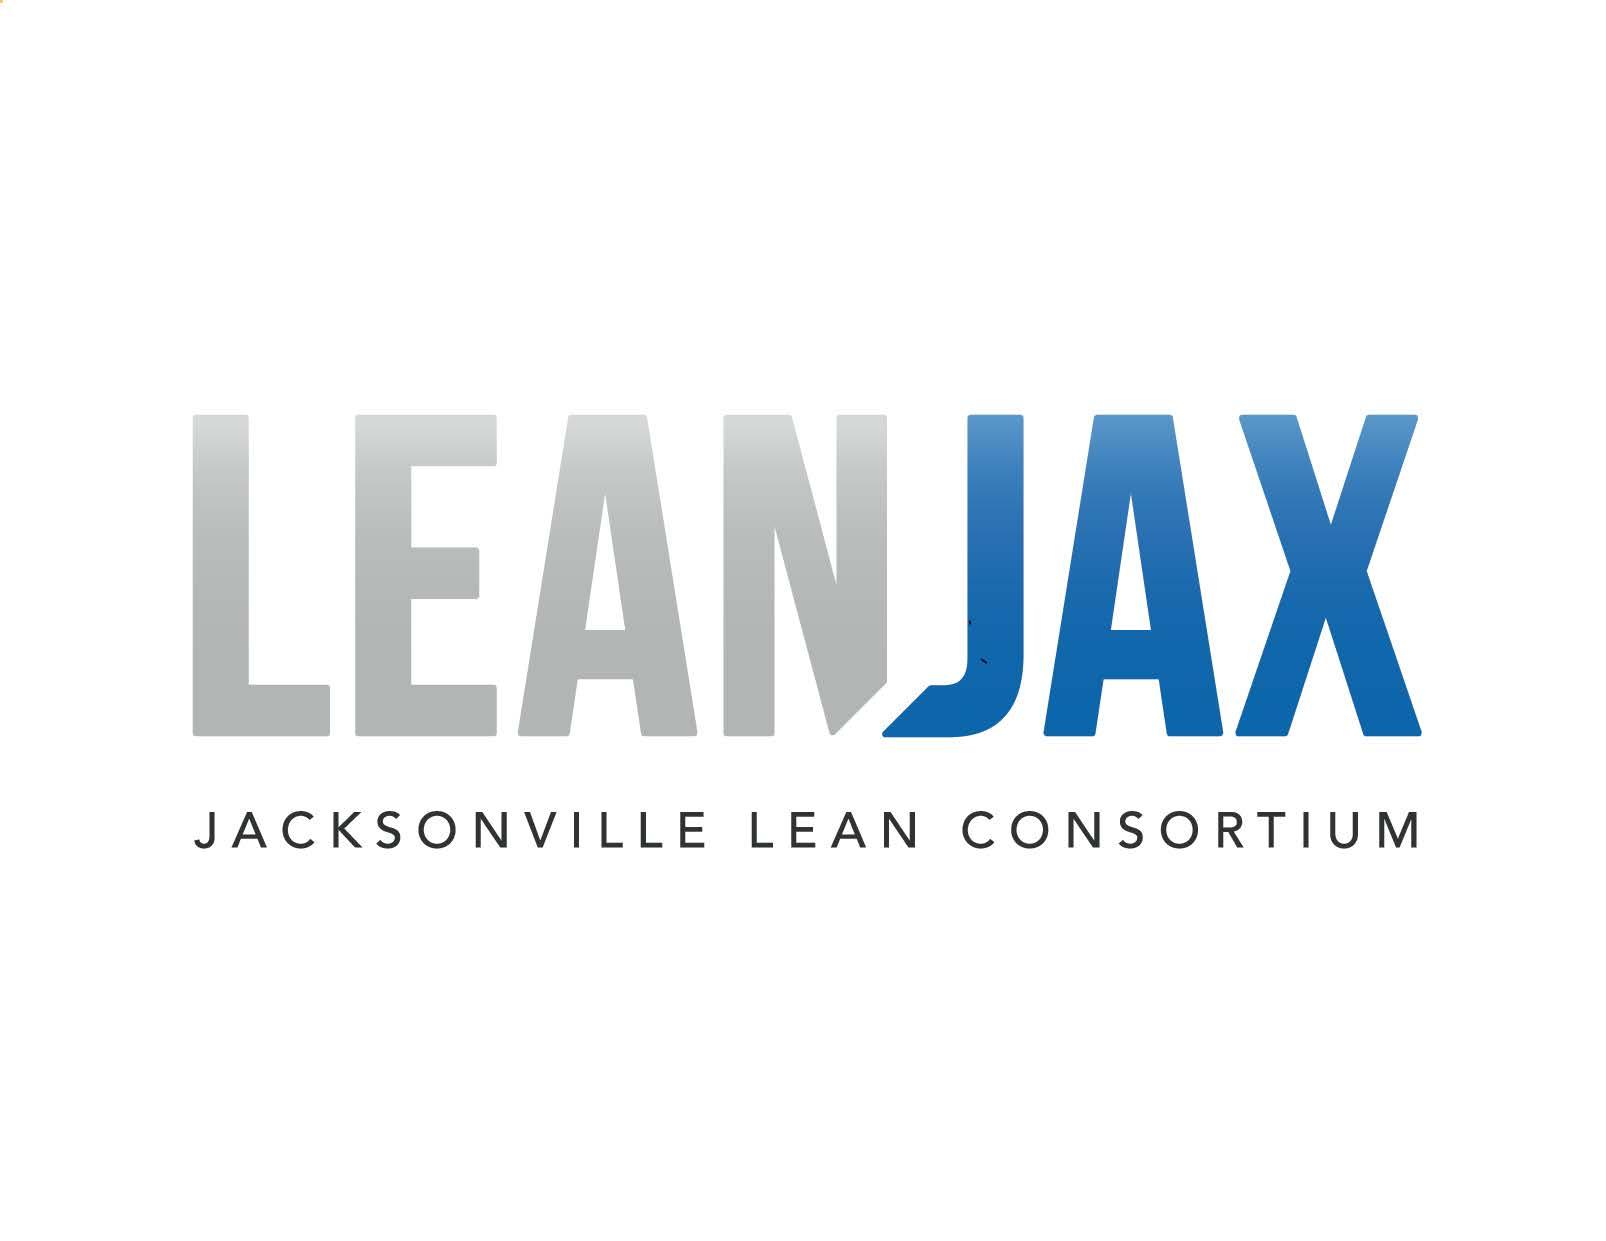 LeanJax-Color.jpg